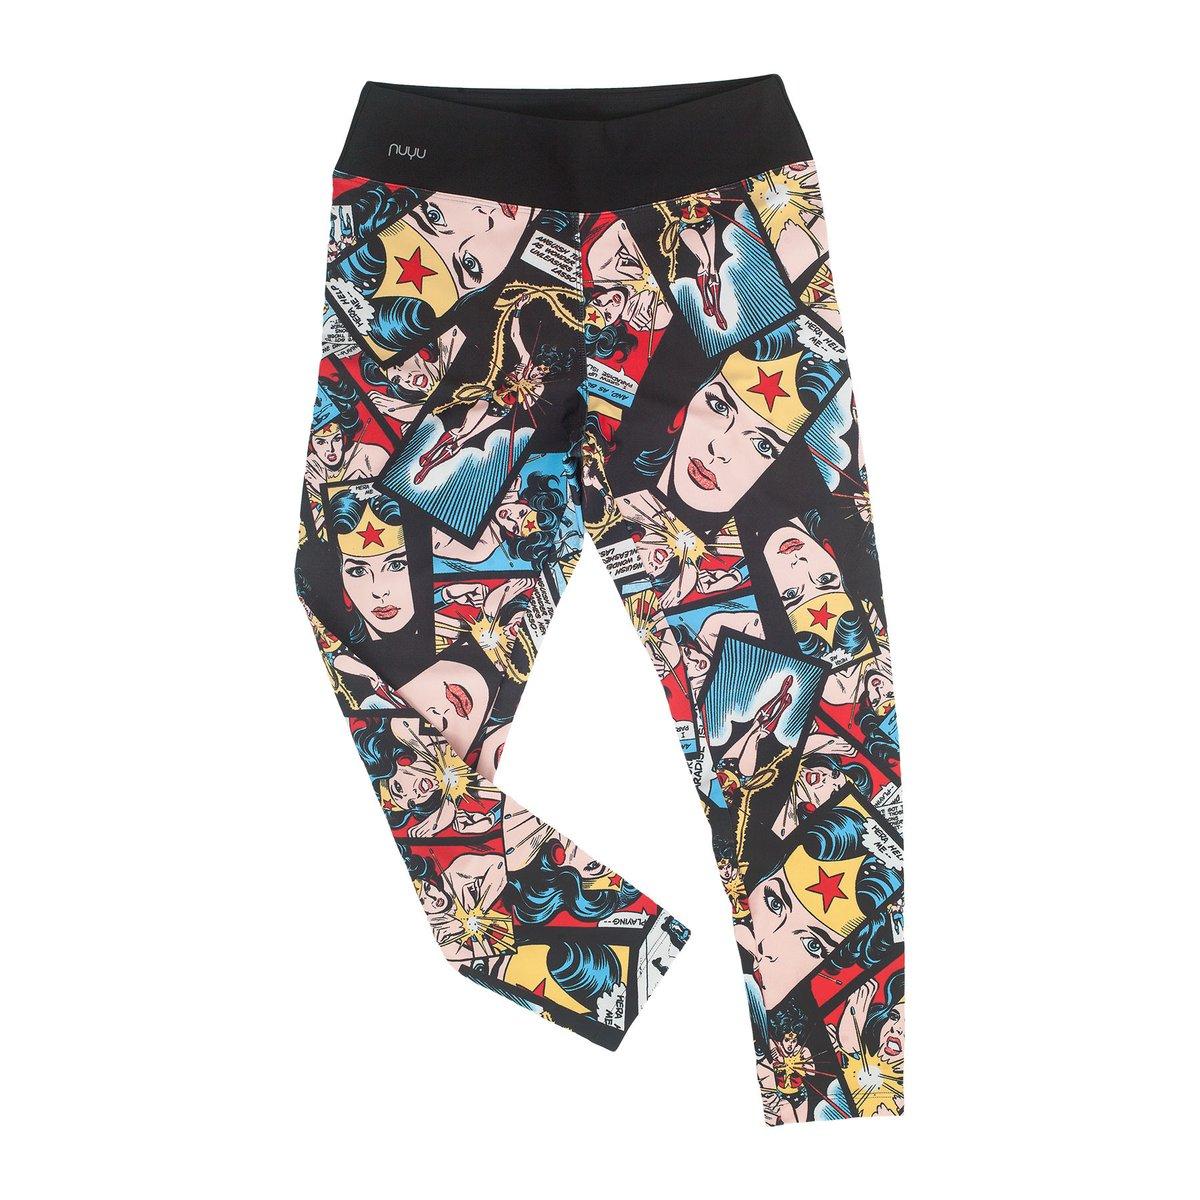 wonder_woman_athletic_apparel_yoga_legging.jpg